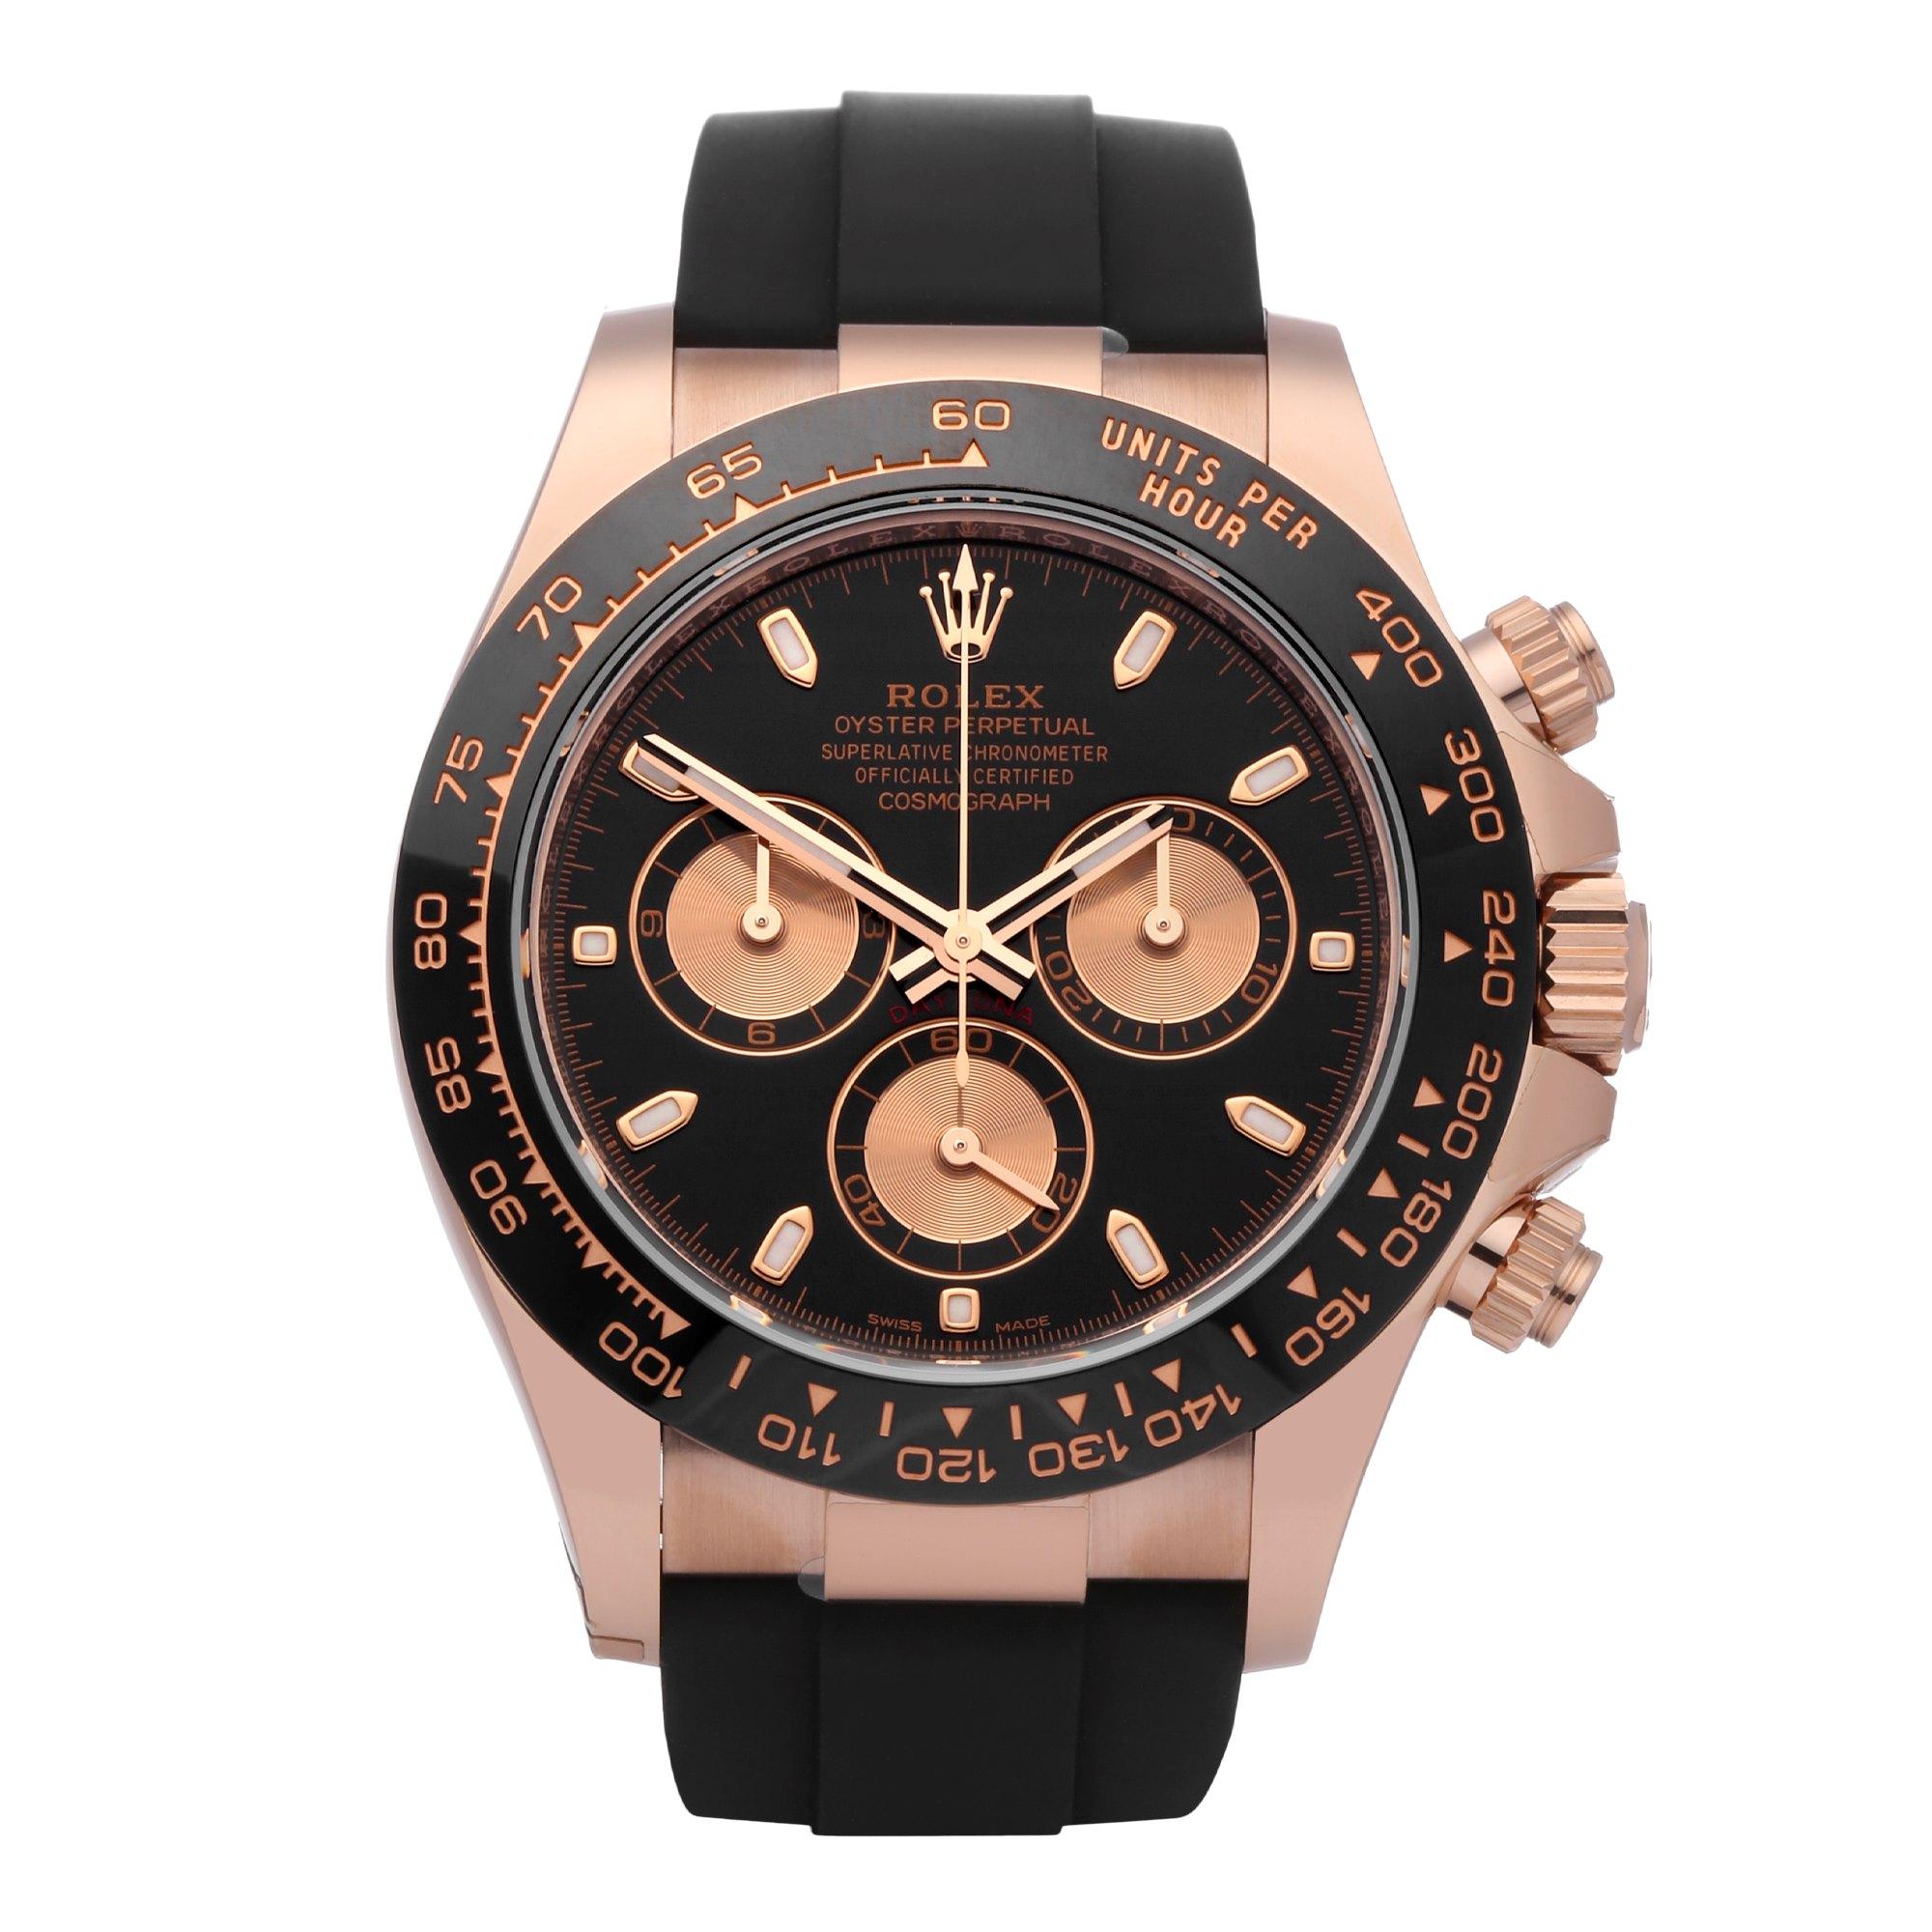 Rolex Daytona 18K Rose Gold 116515LN